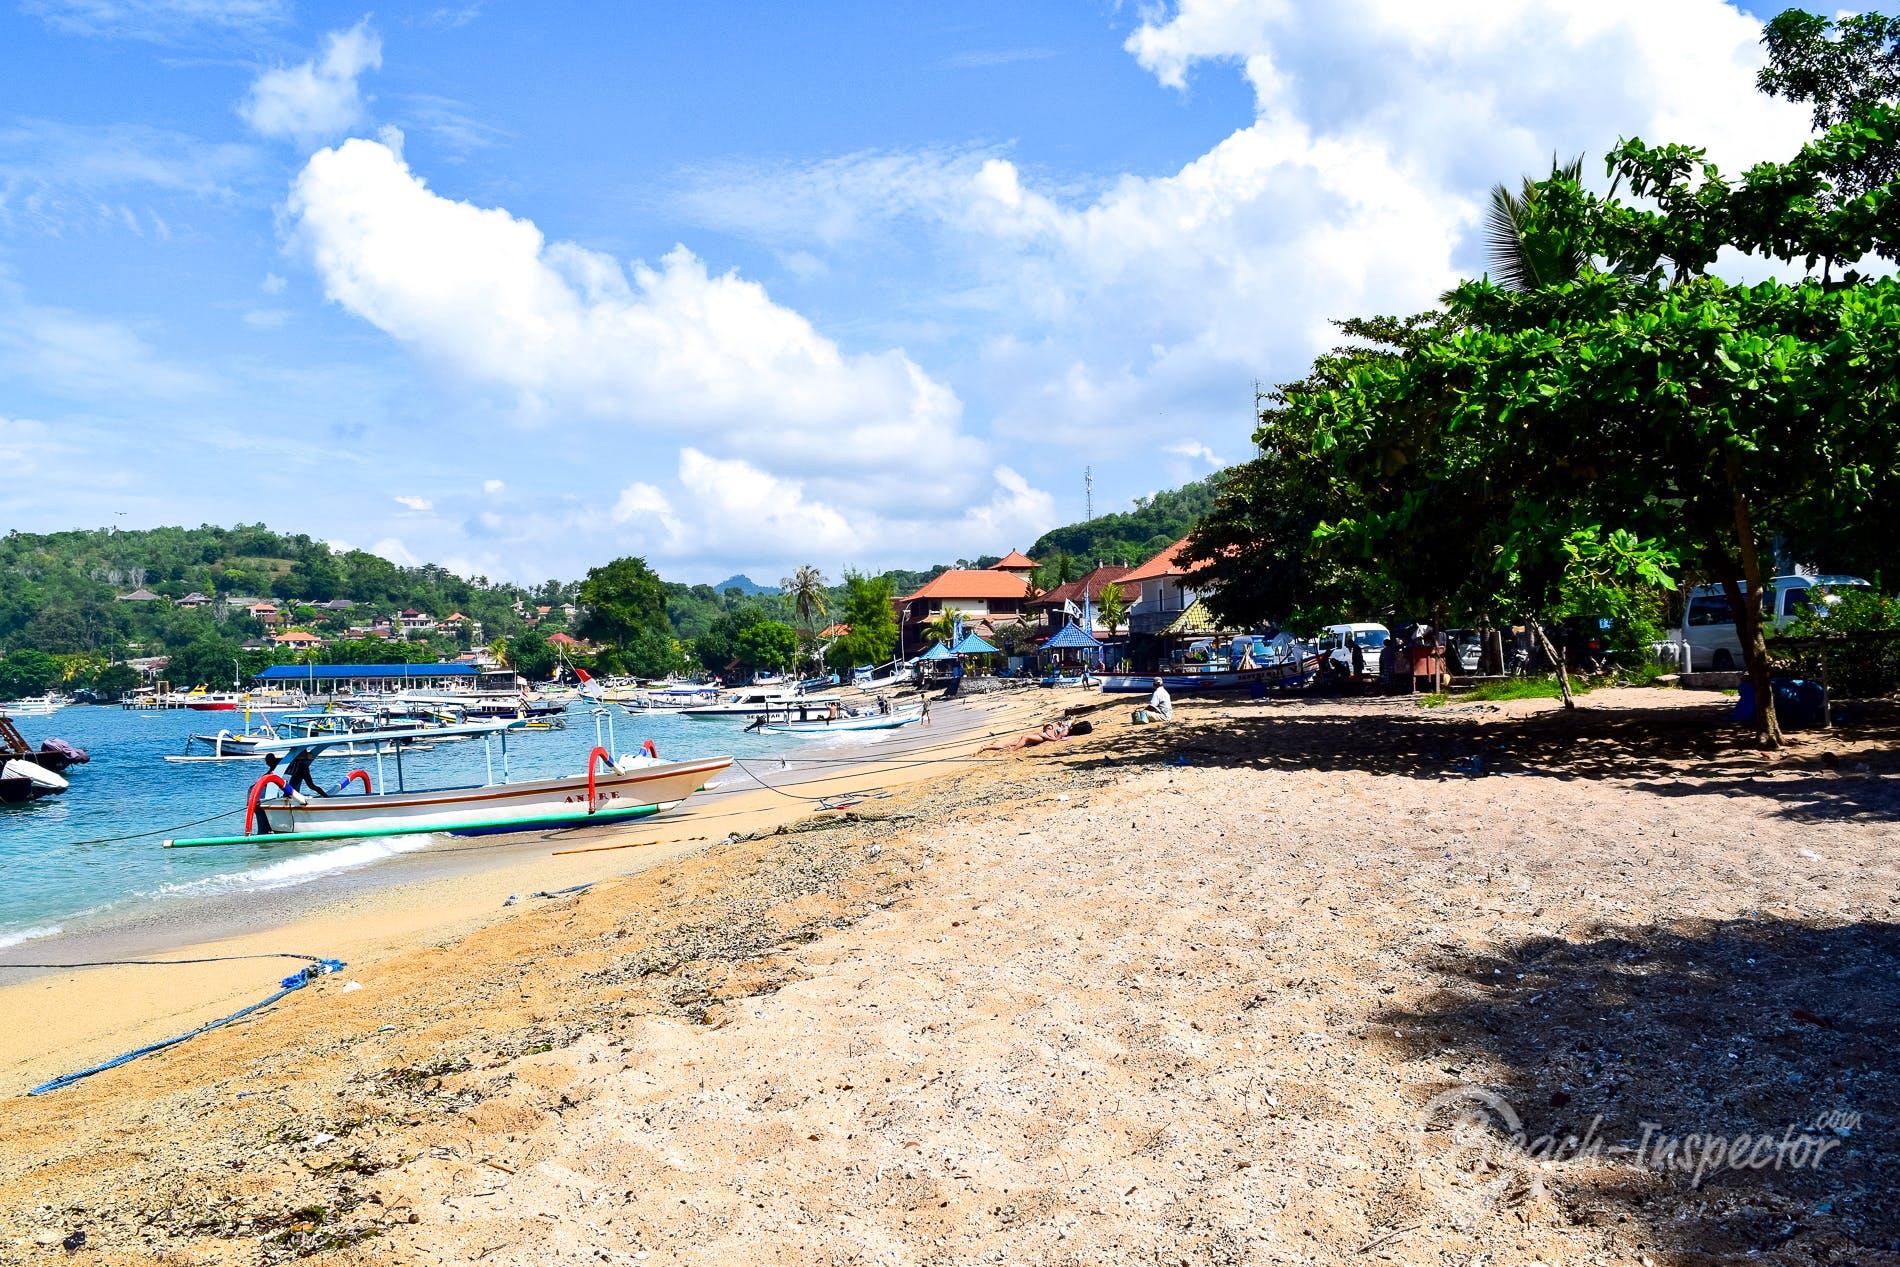 Playa Padang Bai Beach, Bali, Indonesia